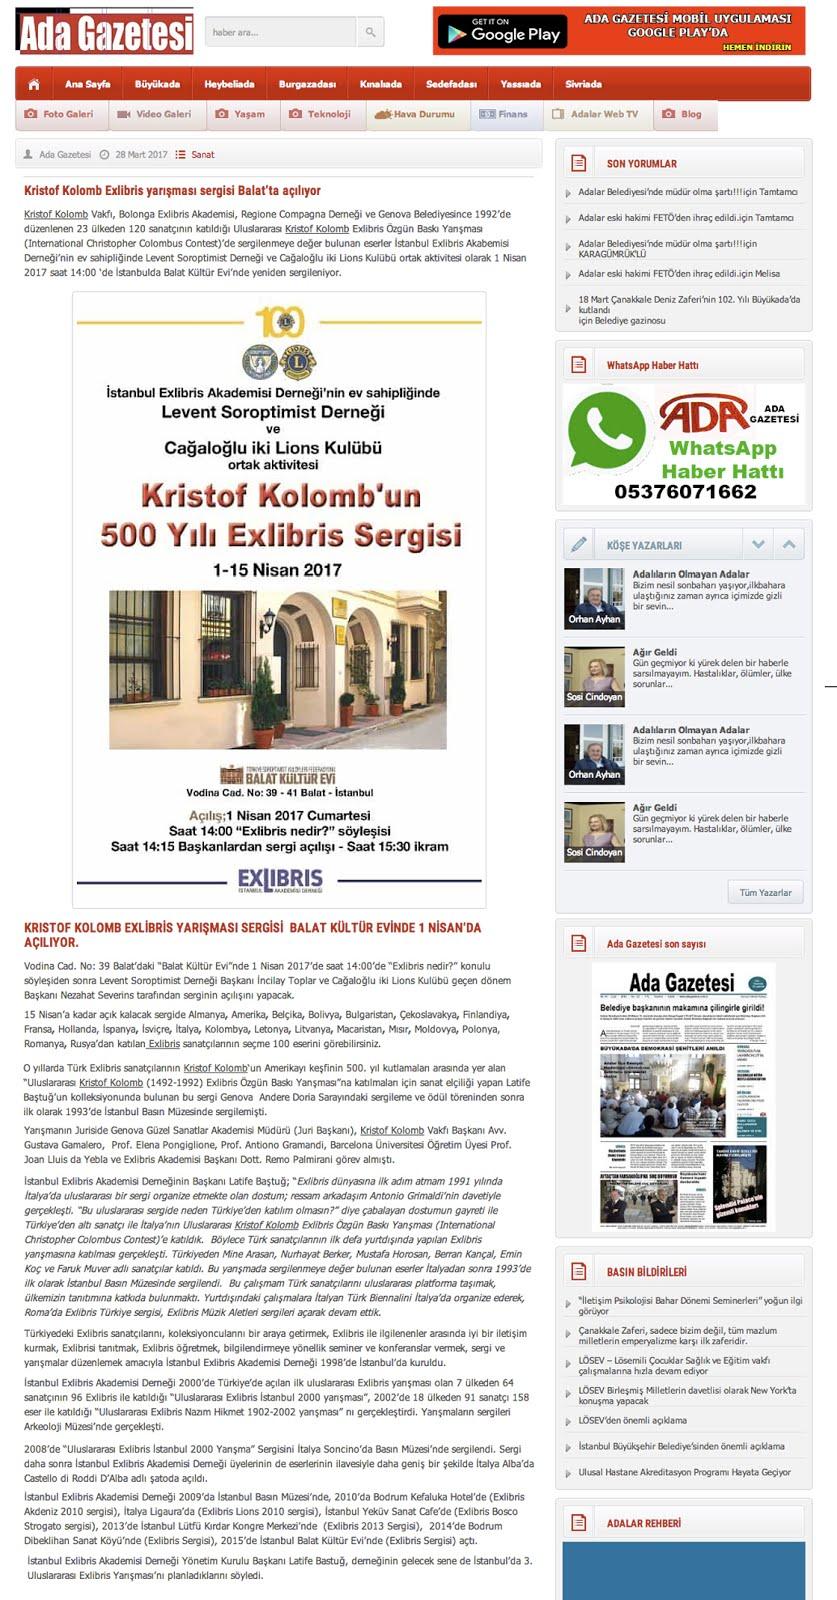 1 Ada Gazetesi